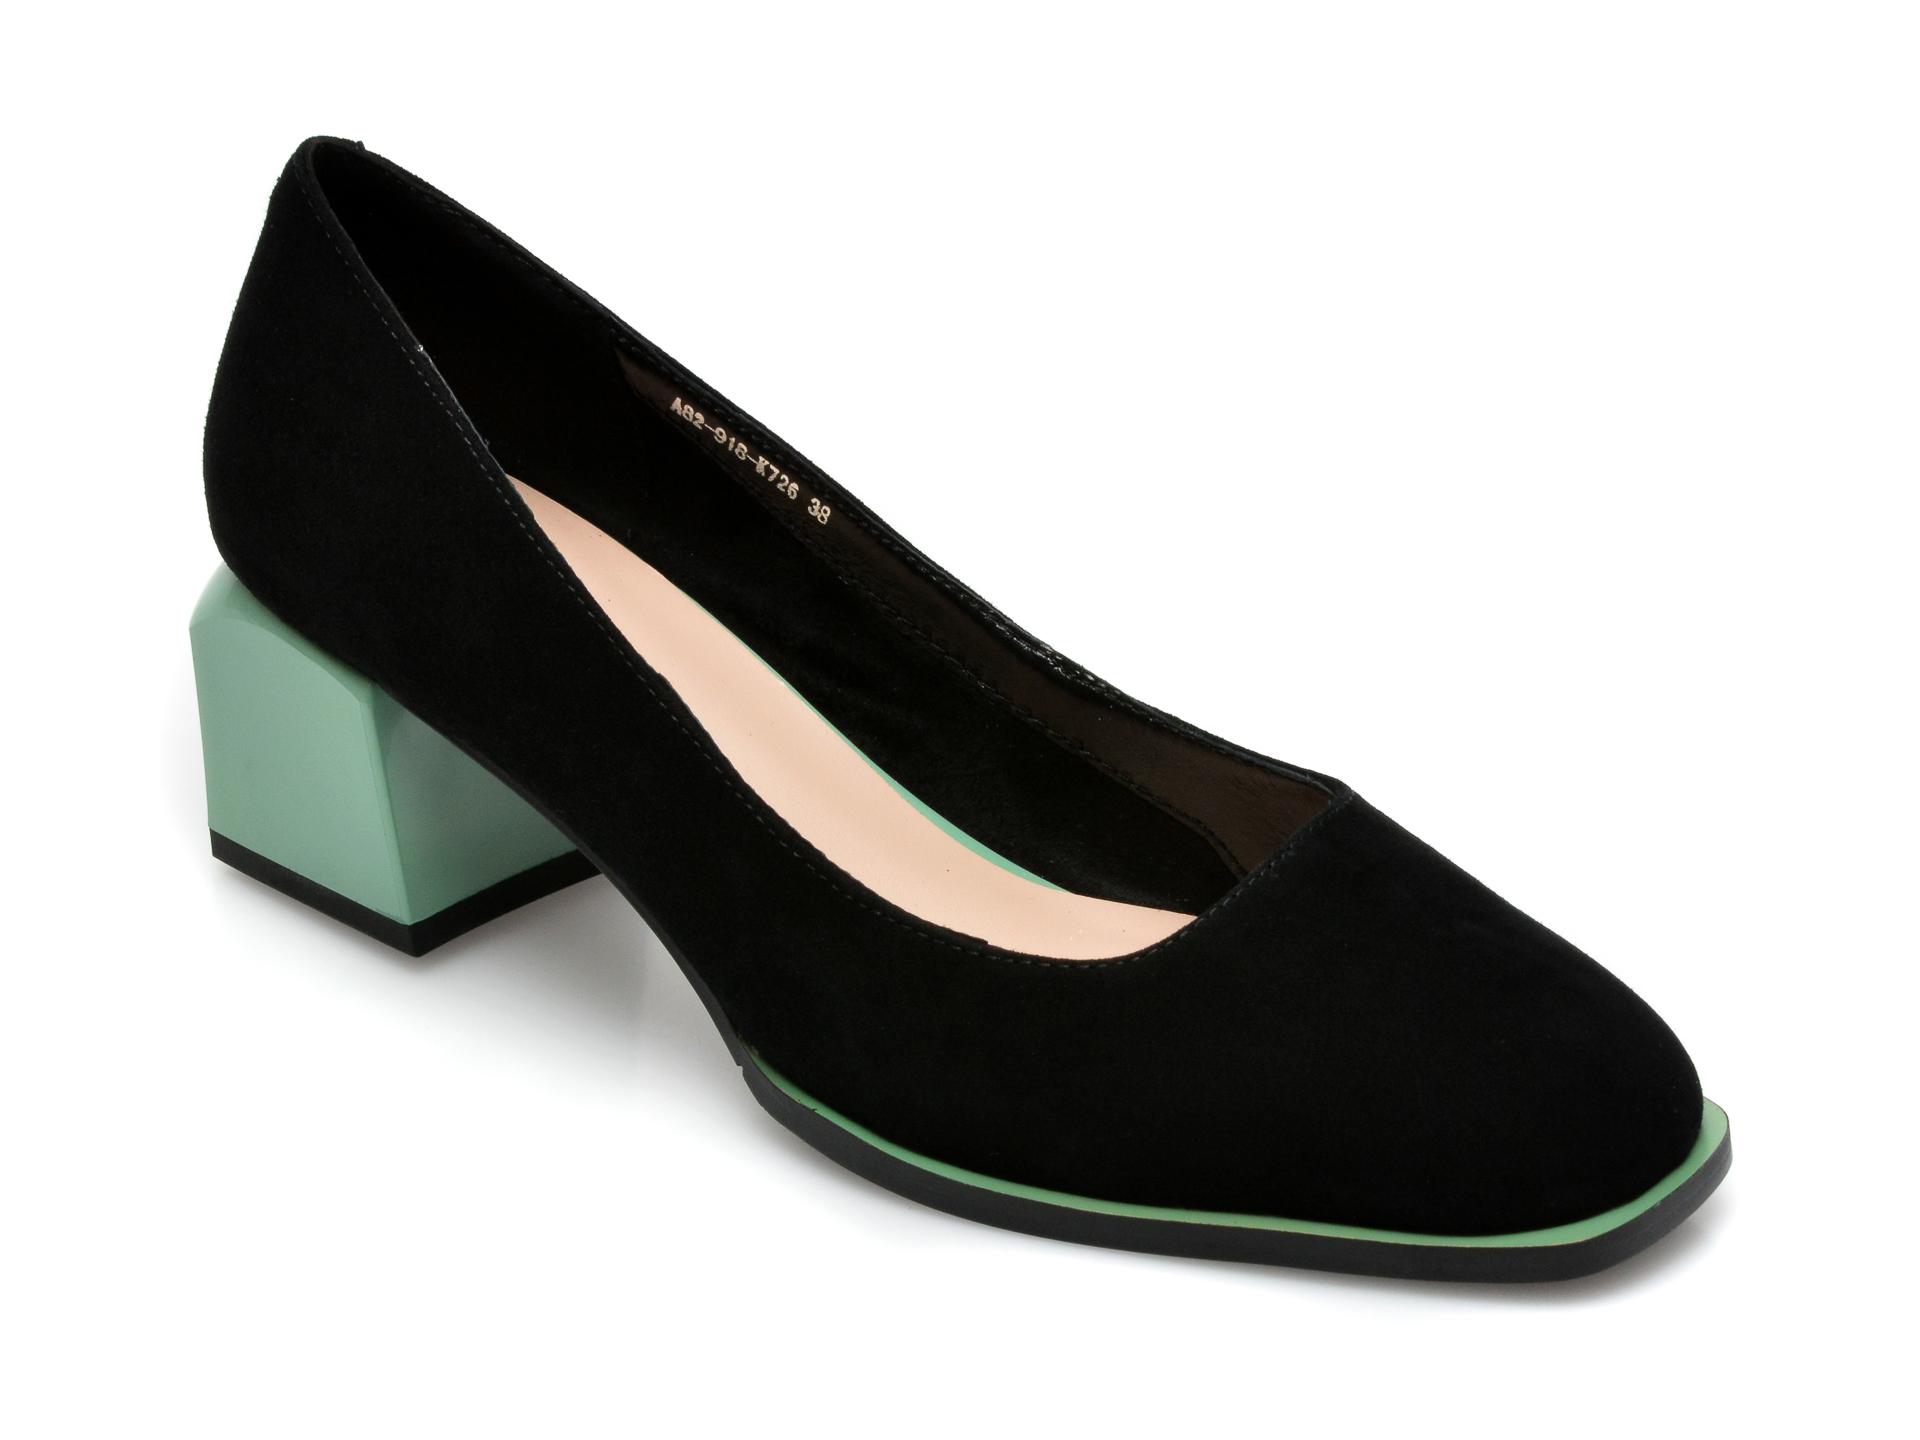 Pantofi EPICA negri, A82918K, din piele intoarsa imagine otter.ro 2021